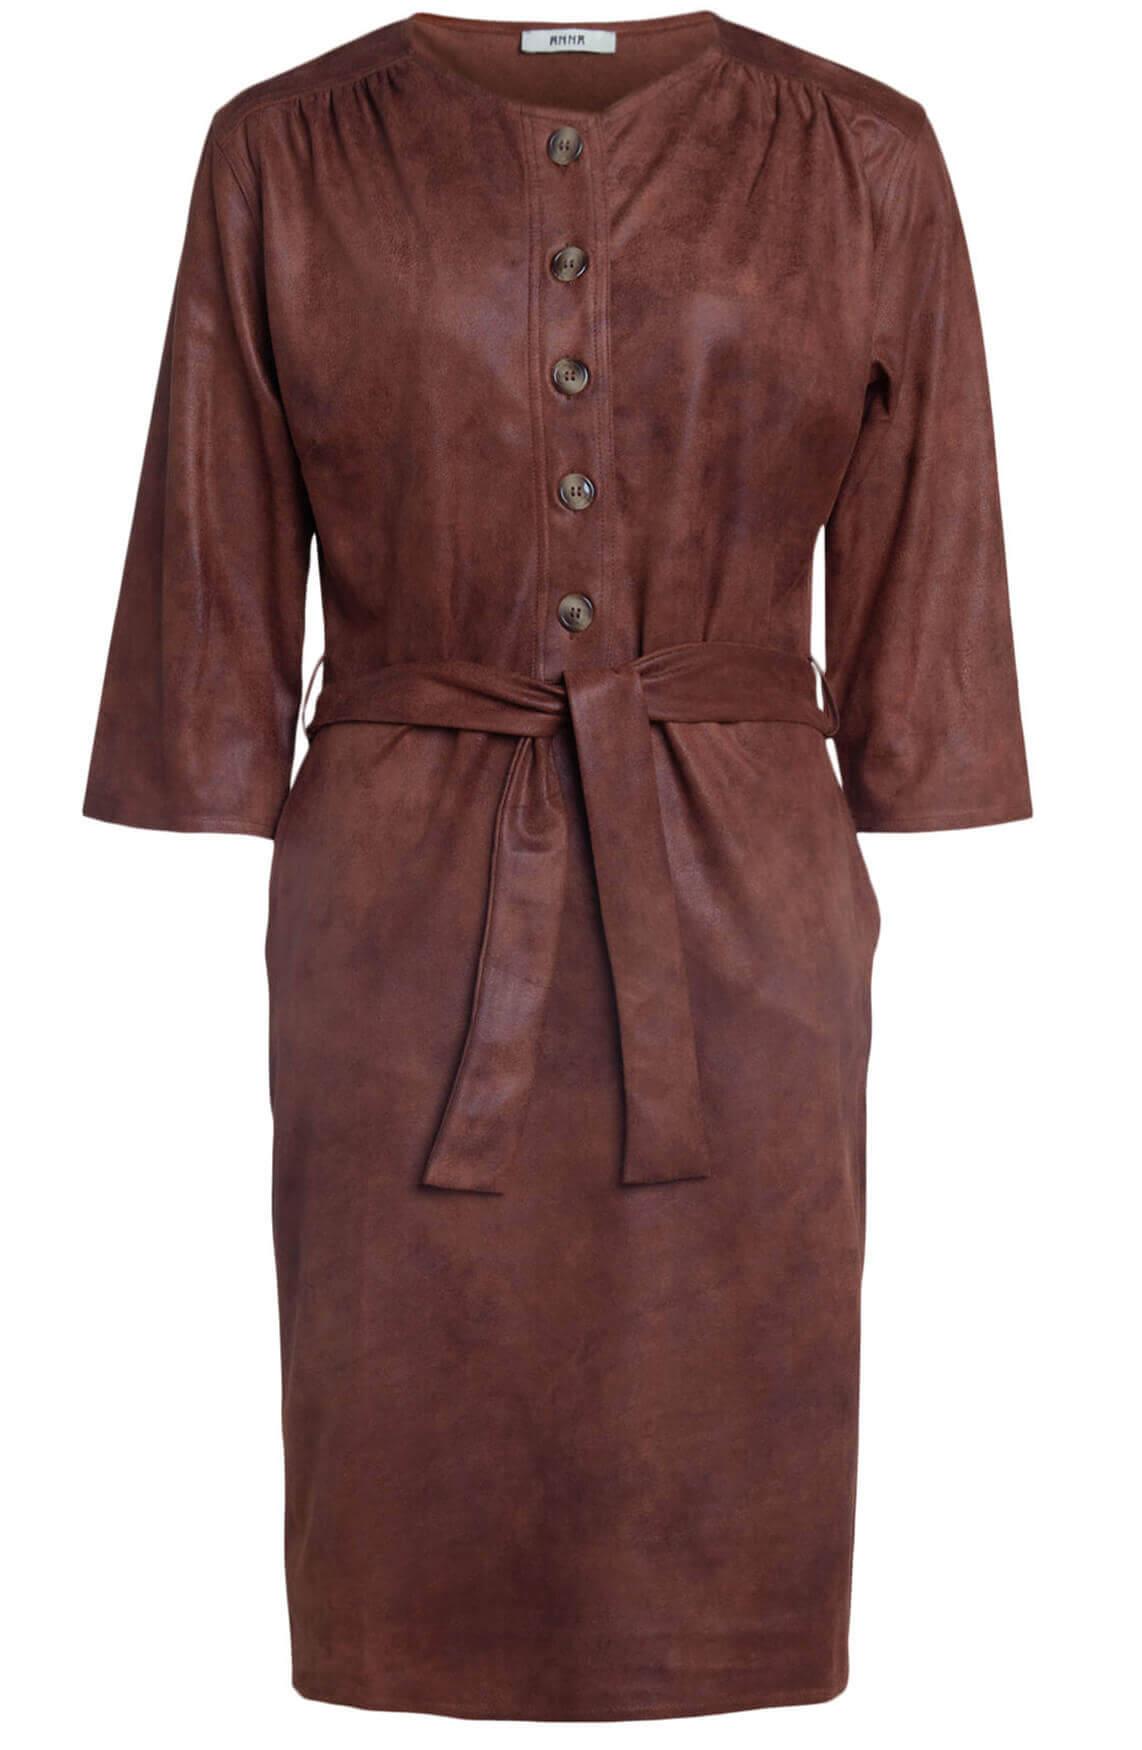 Anna Dames Suède jurk met knopen Bruin